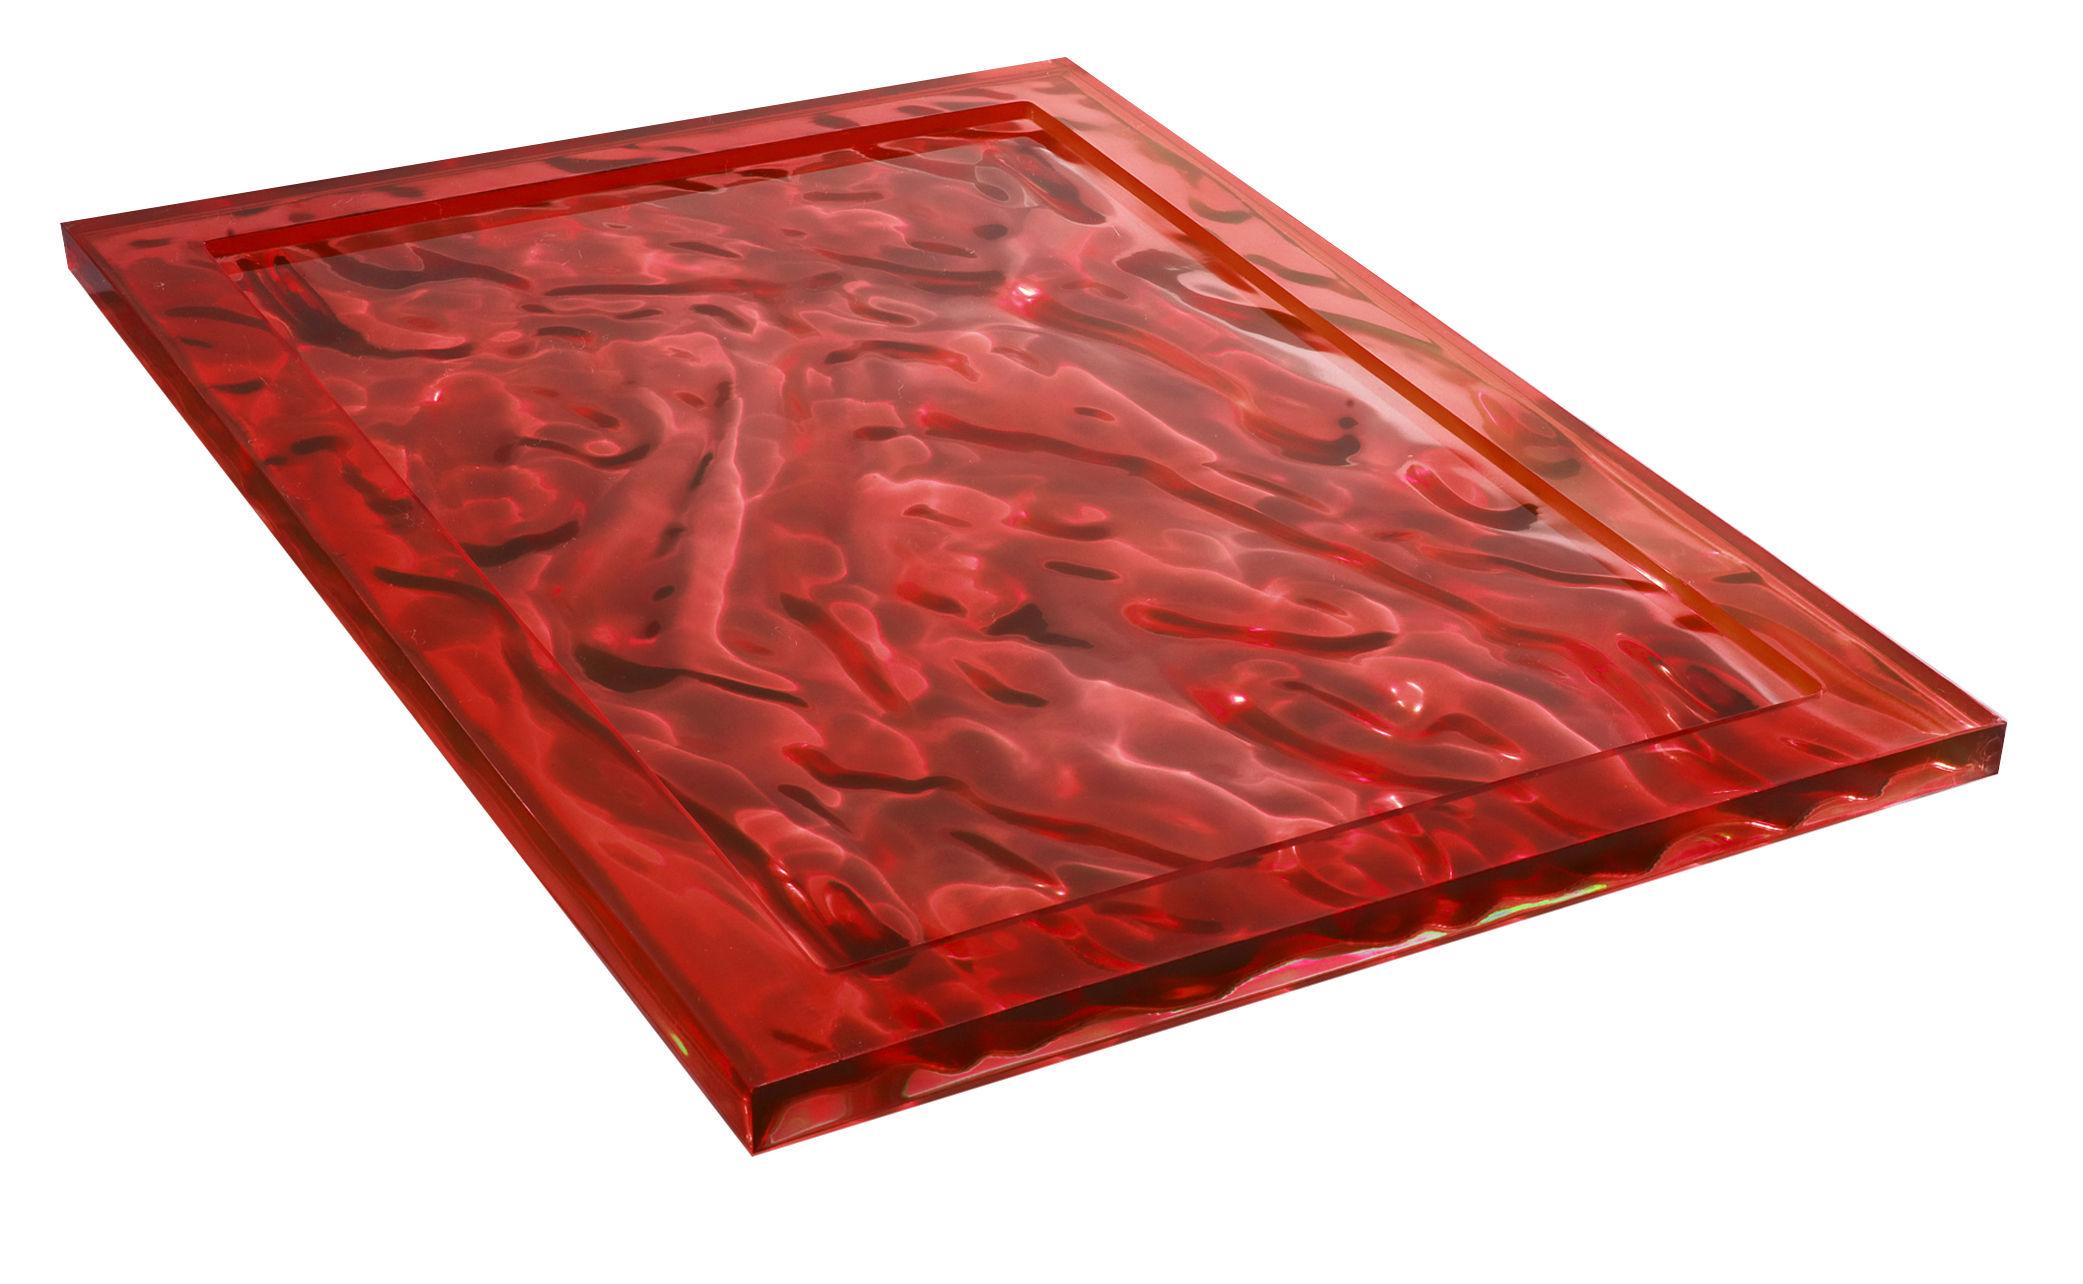 Tavola - Vassoi  - Piano/vassoio Dune - 55 x 38 cm di Kartell - Rosso - Tecnopolimero